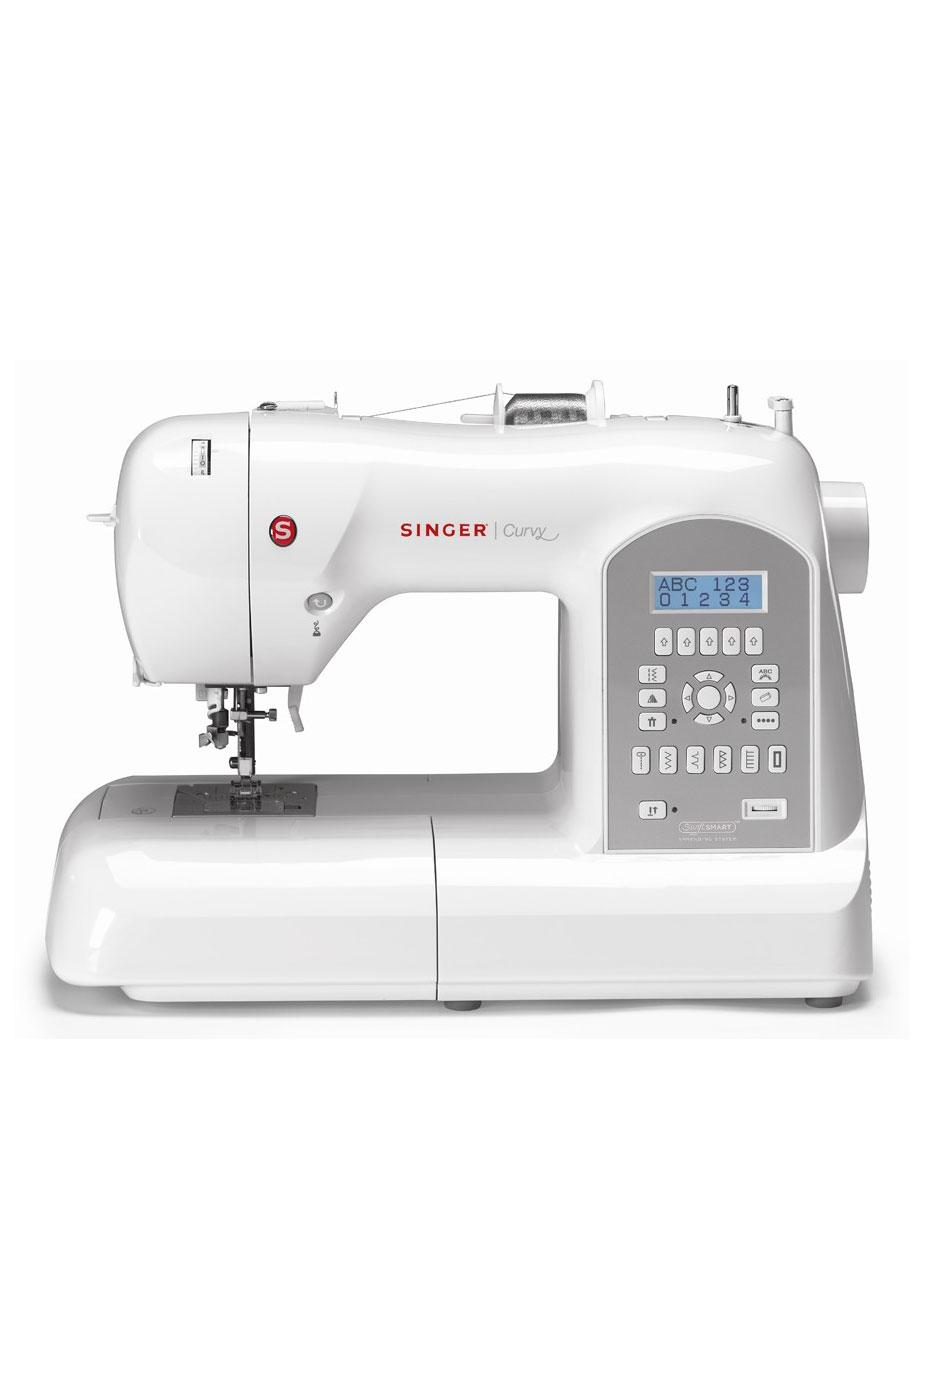 27stitch sewing machine lx2763